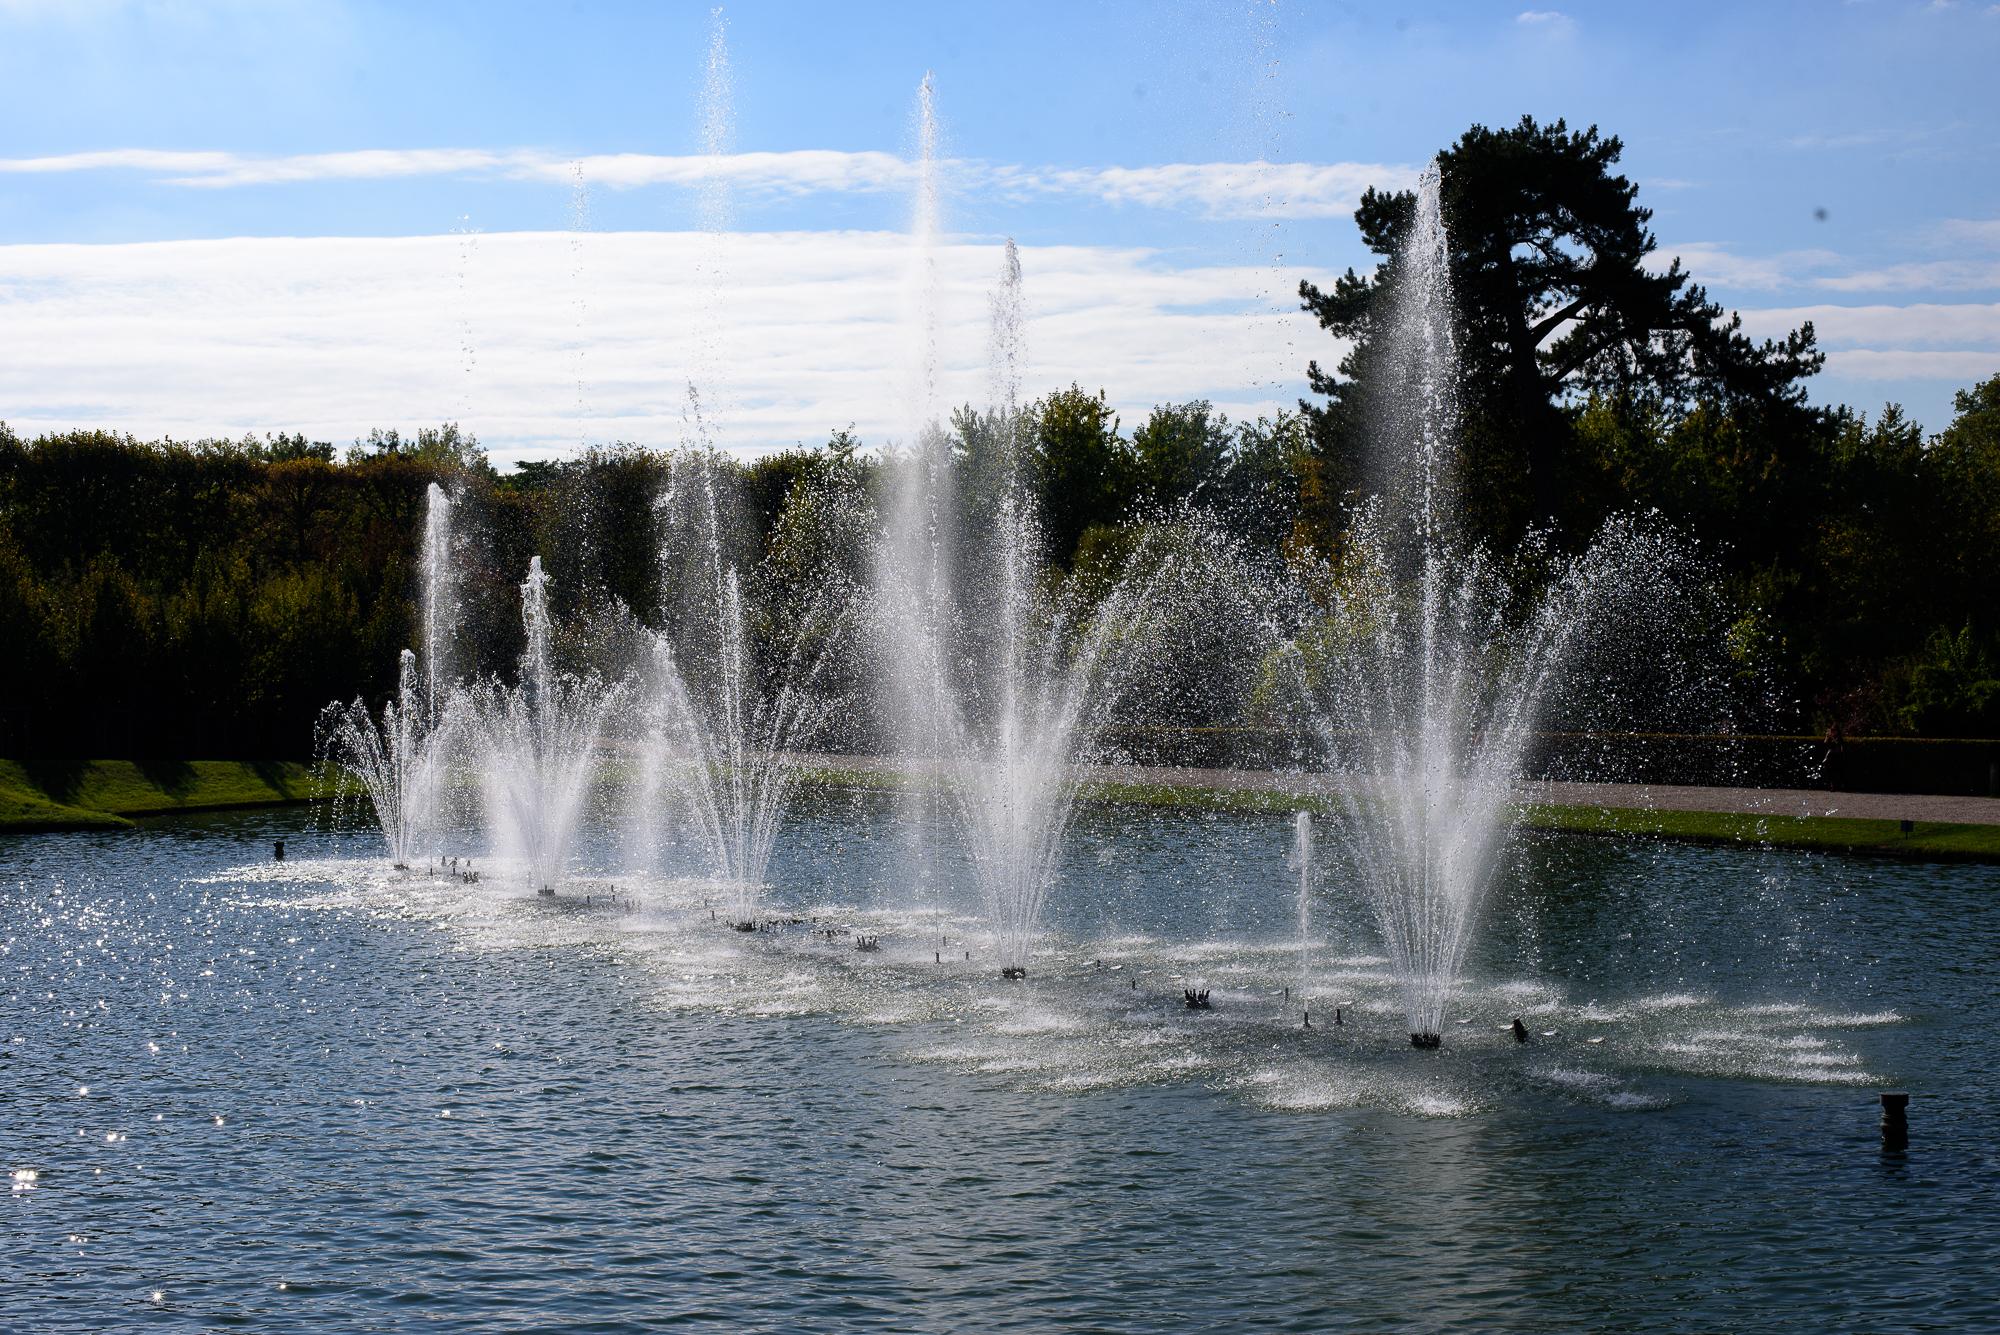 palace-of-versailles-garden-5